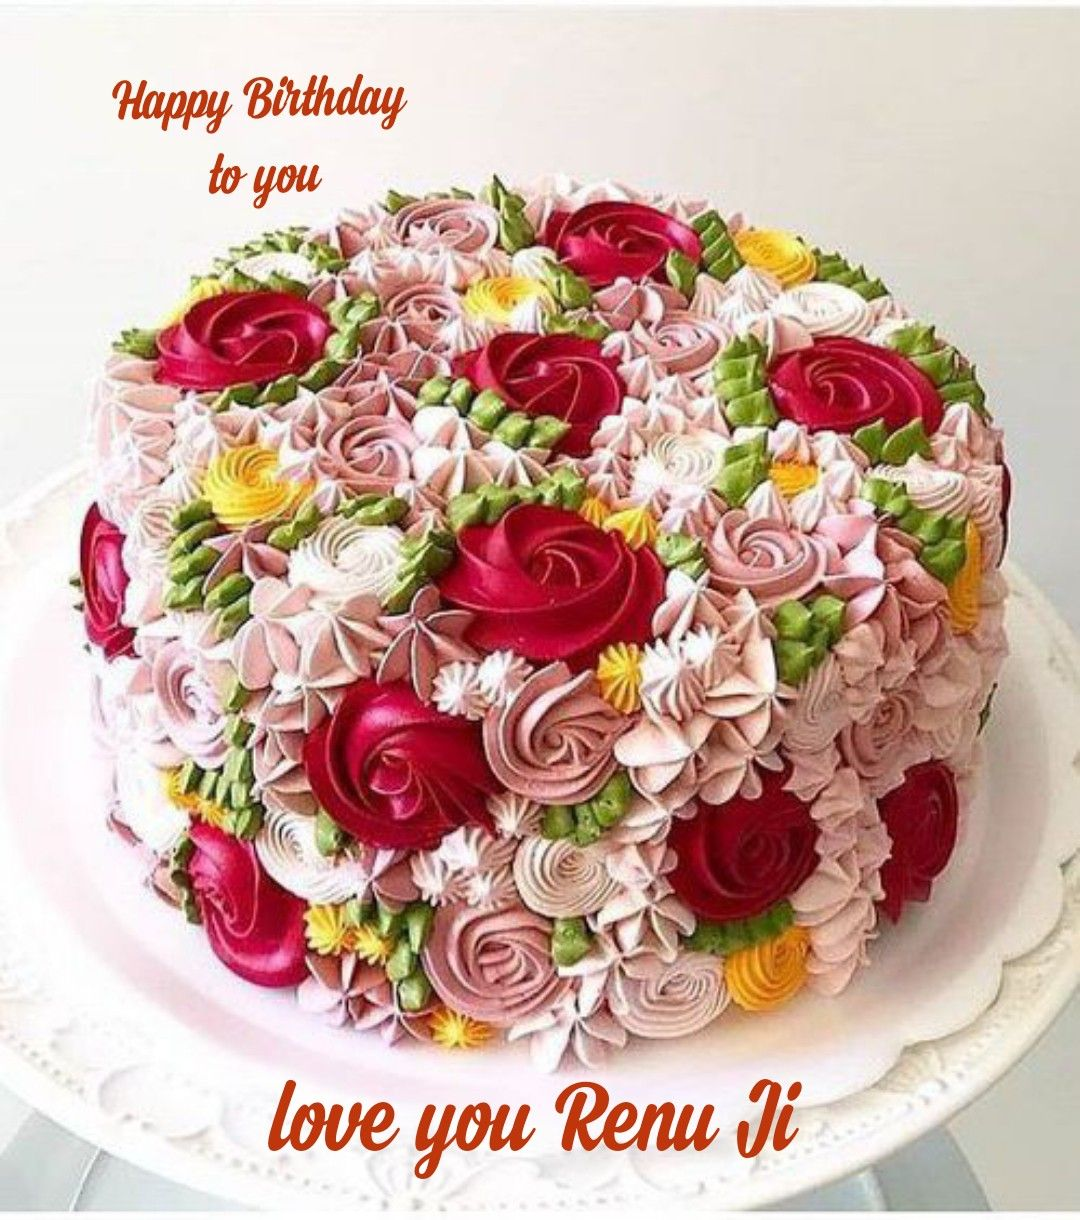 Pin By Amira Elbando On Happy Birthday Anni Birthday Cake Decorating Cake Cover Cake Decorating